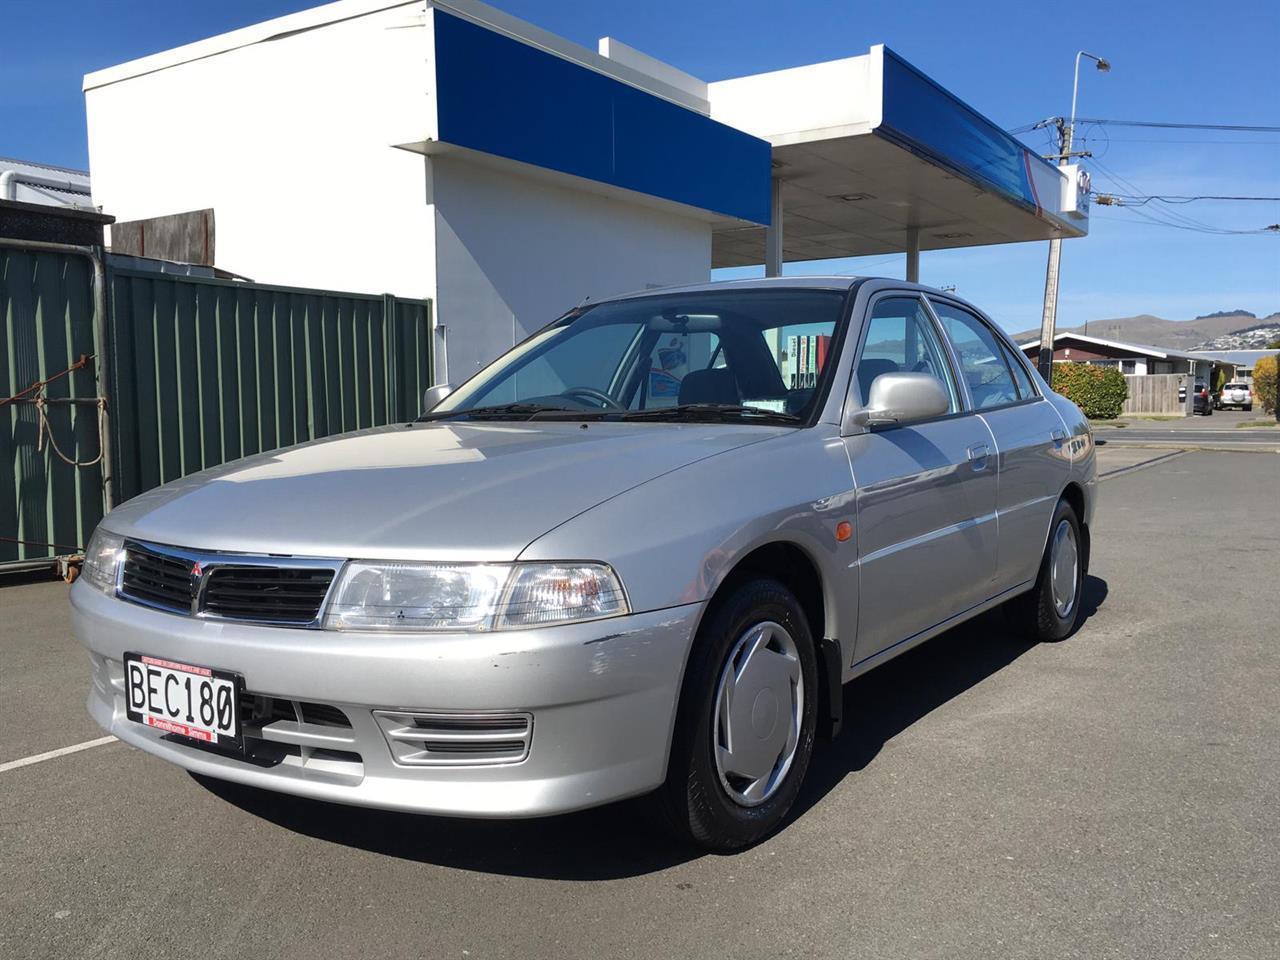 image-16, 2003 Mitsubishi LANCER at Christchurch